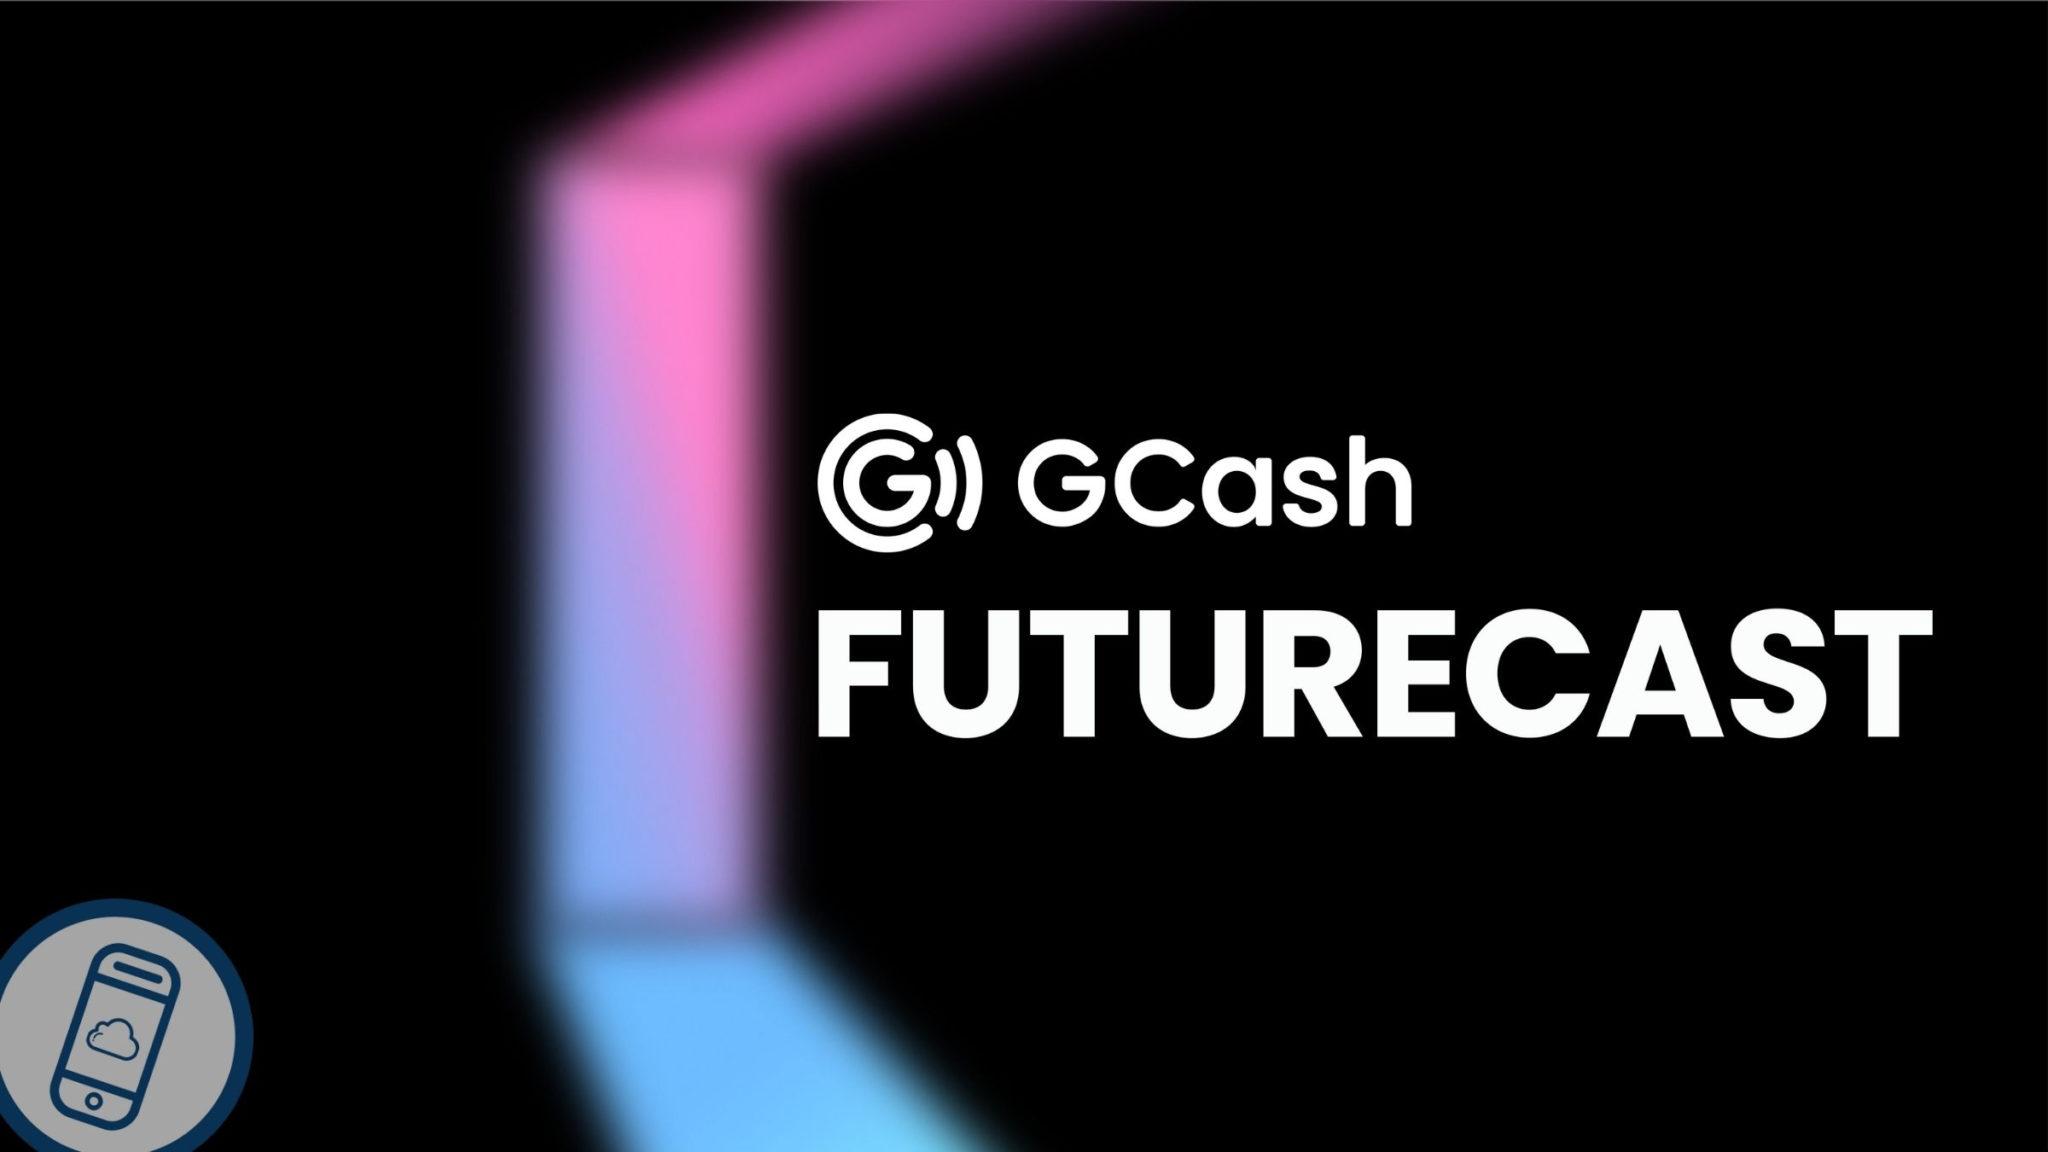 GCash Futurecast 2021 Header